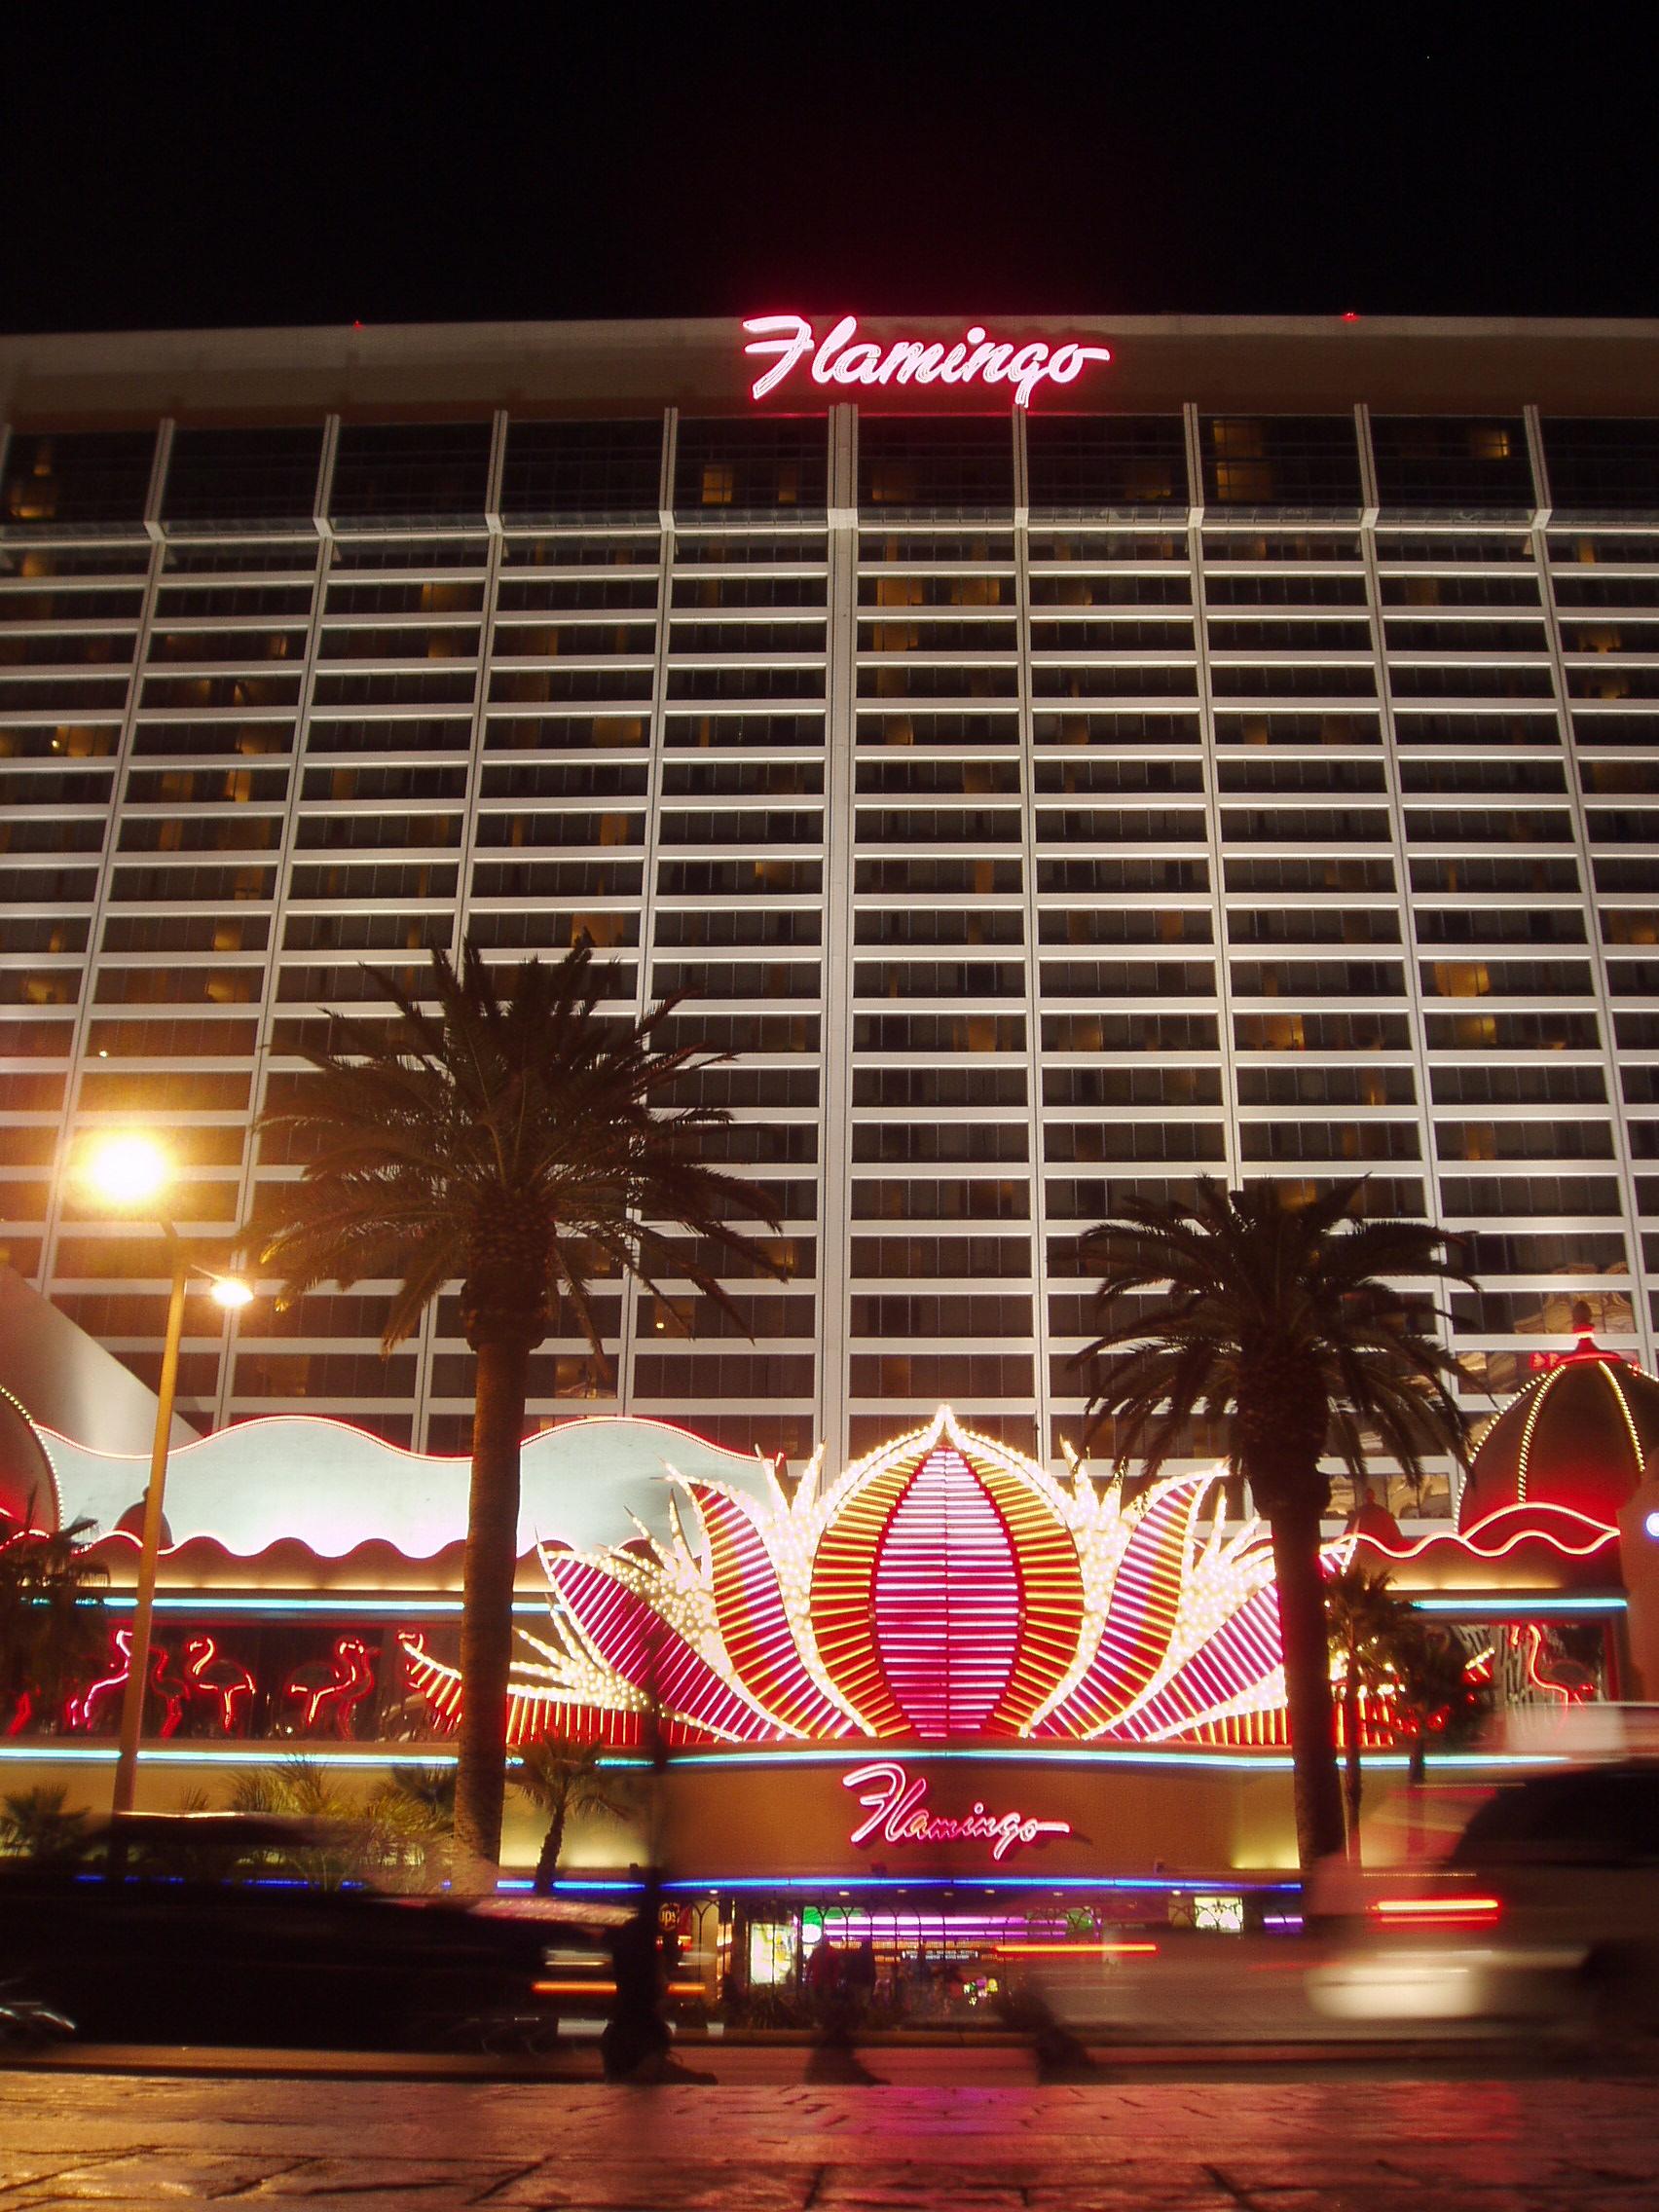 Flamingo Hotel Go Room